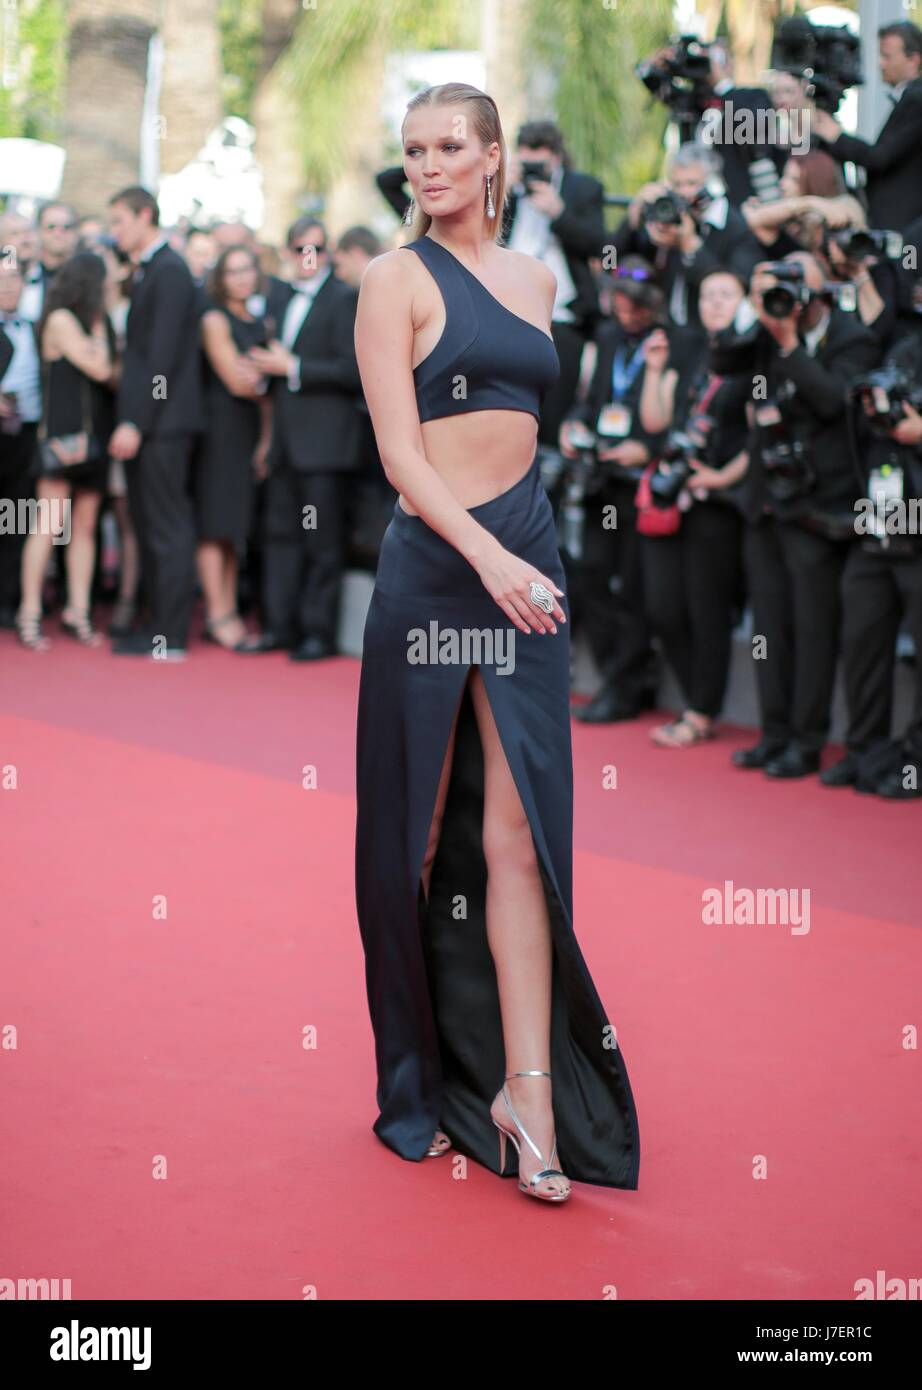 Eva longoria cleavage nude (12 photos), Sexy Celebrity image